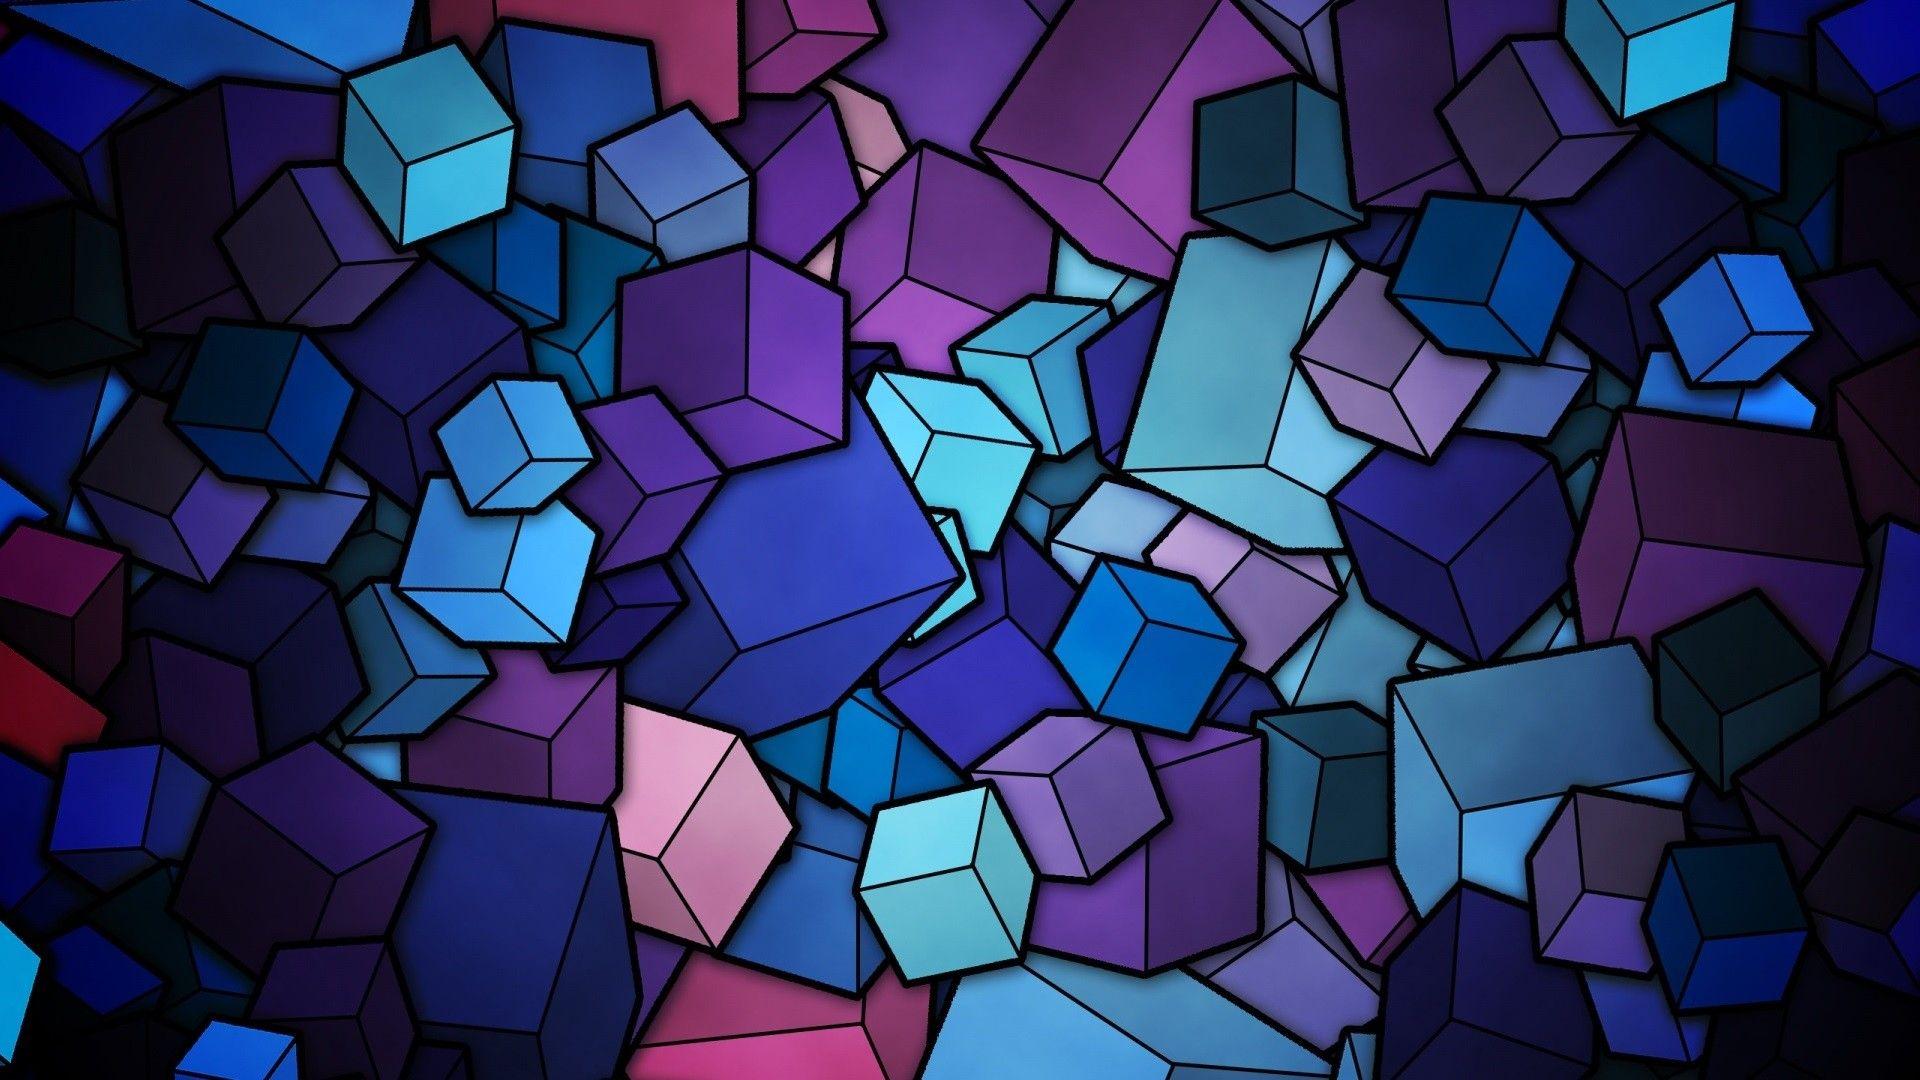 Geometry Cubes HD Wallpaper FullHDWpp   Full HD Wallpapers 1920x1080